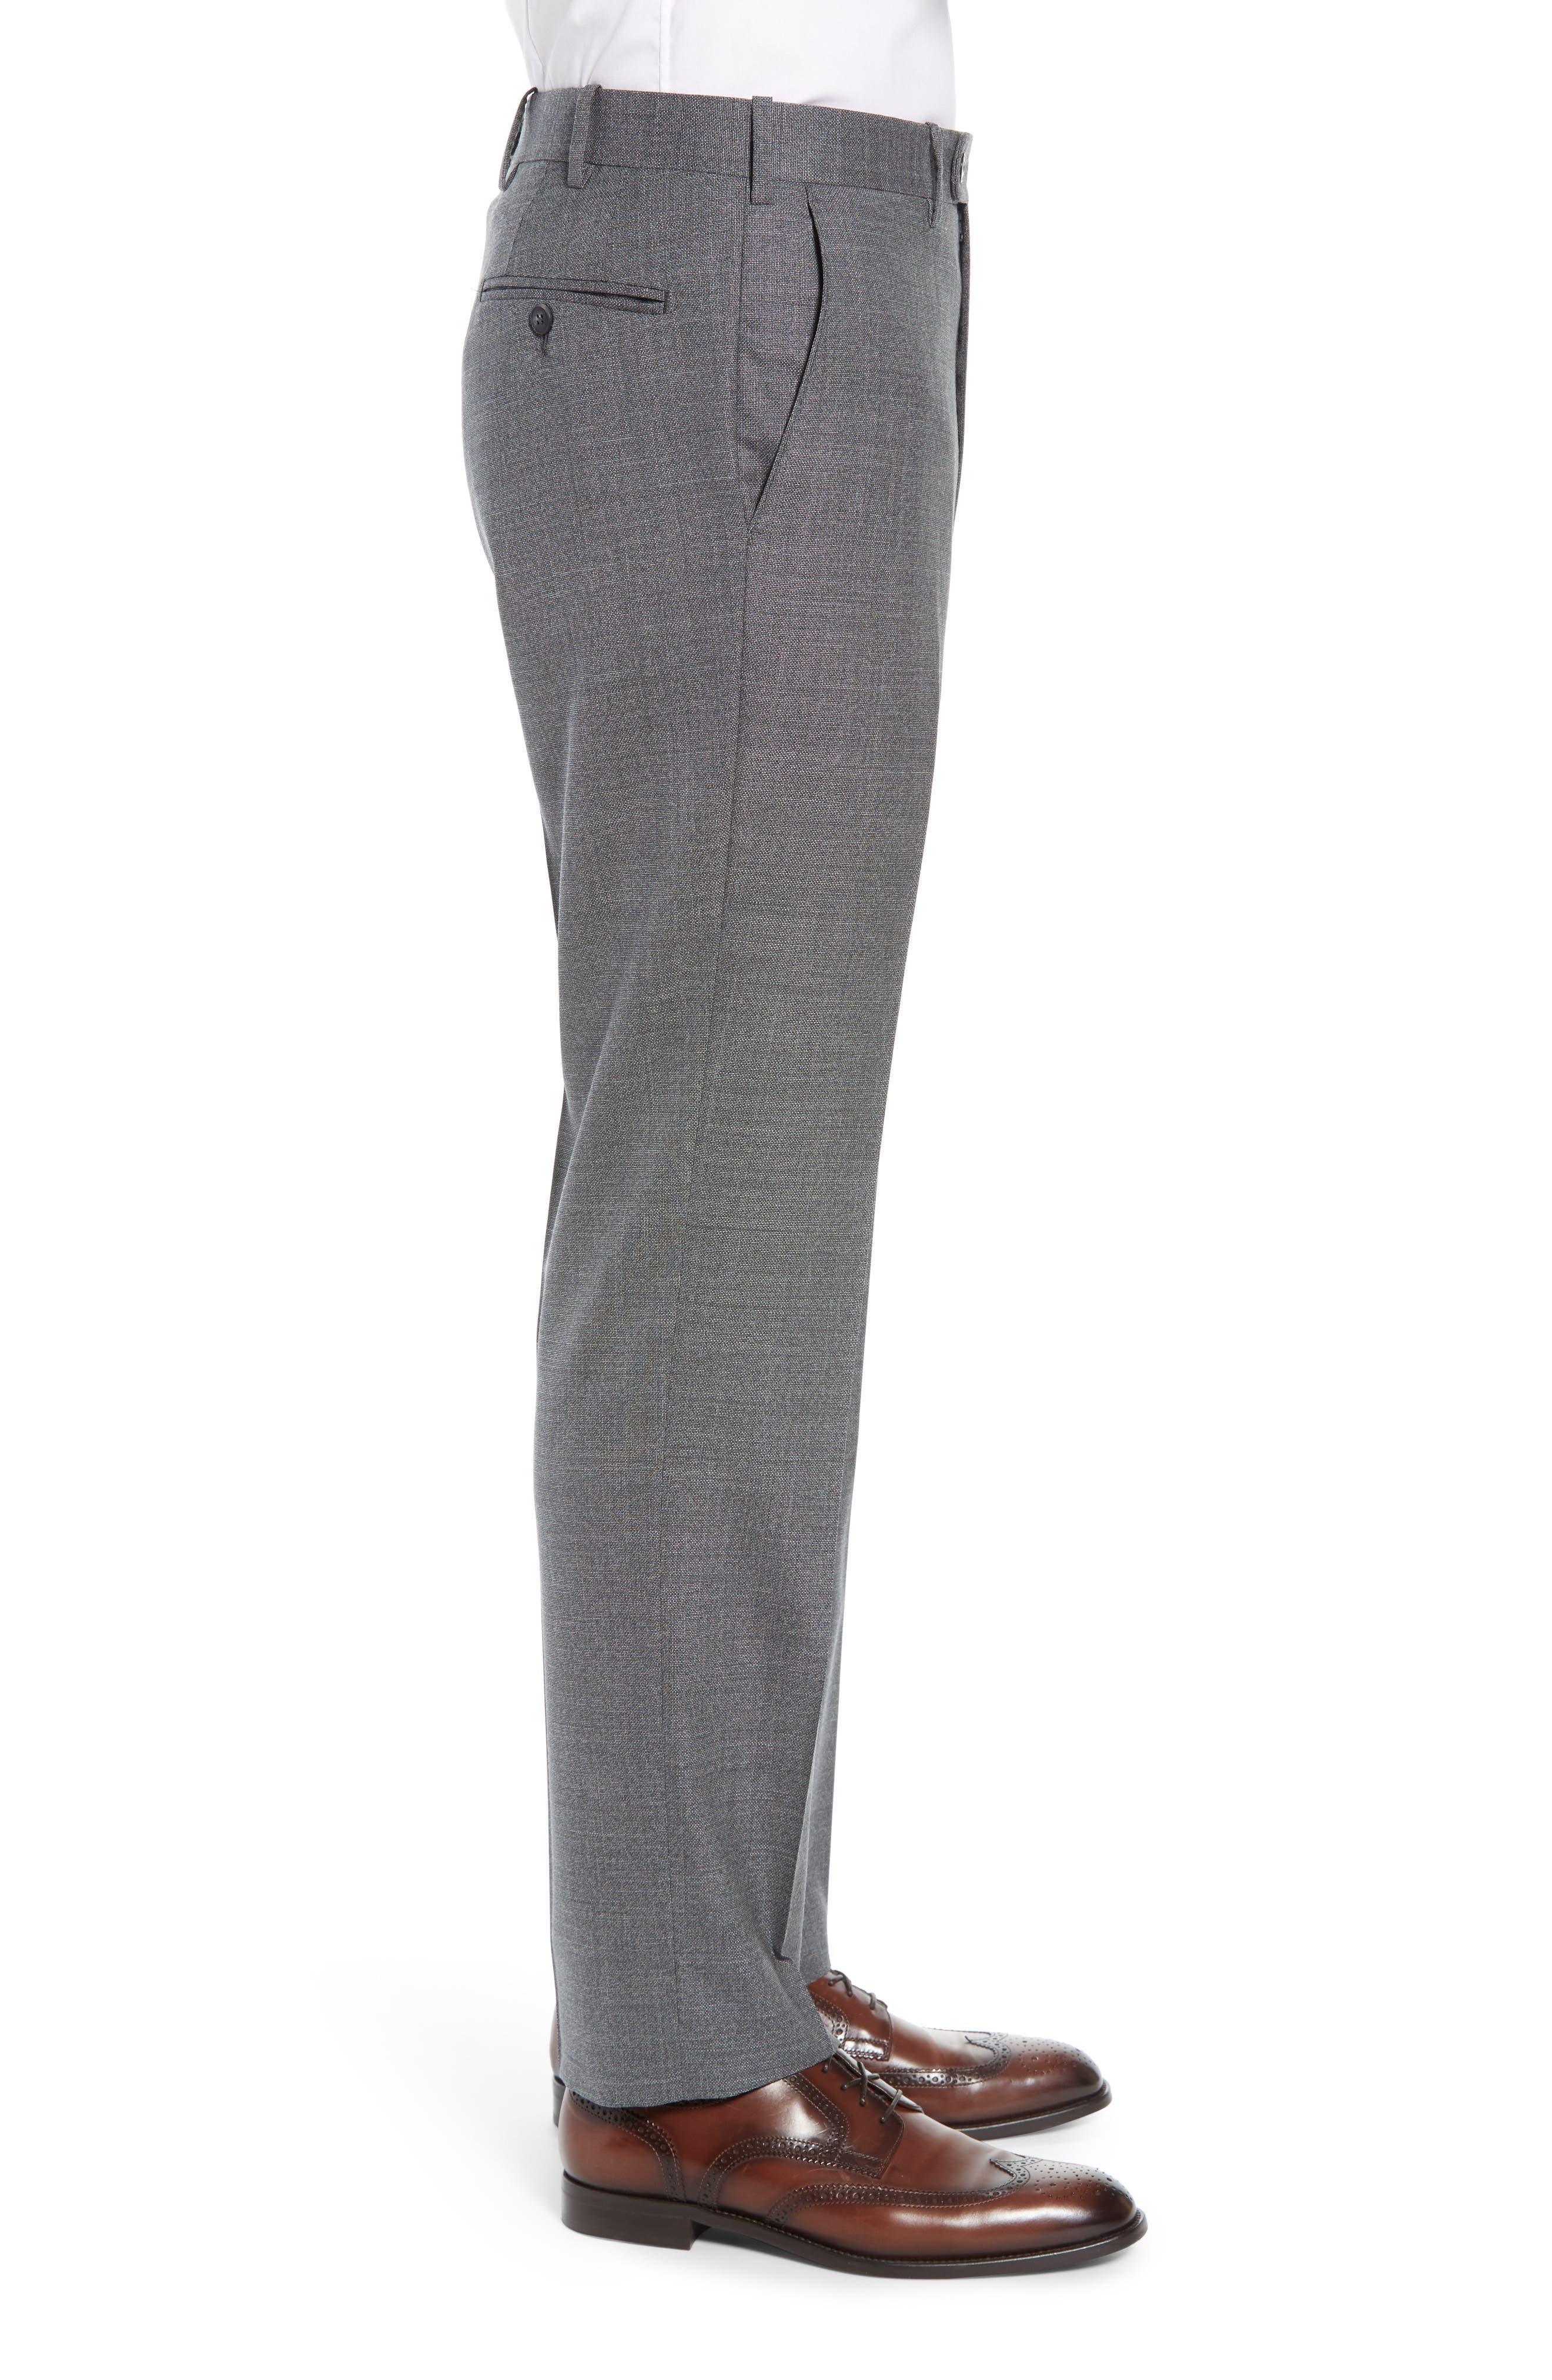 JOHN W. NORDSTROM<SUP>®</SUP>, Torino Flat Front Solid Wool Trousers, Alternate thumbnail 3, color, GREY PHANTOM BASKET WEAVE